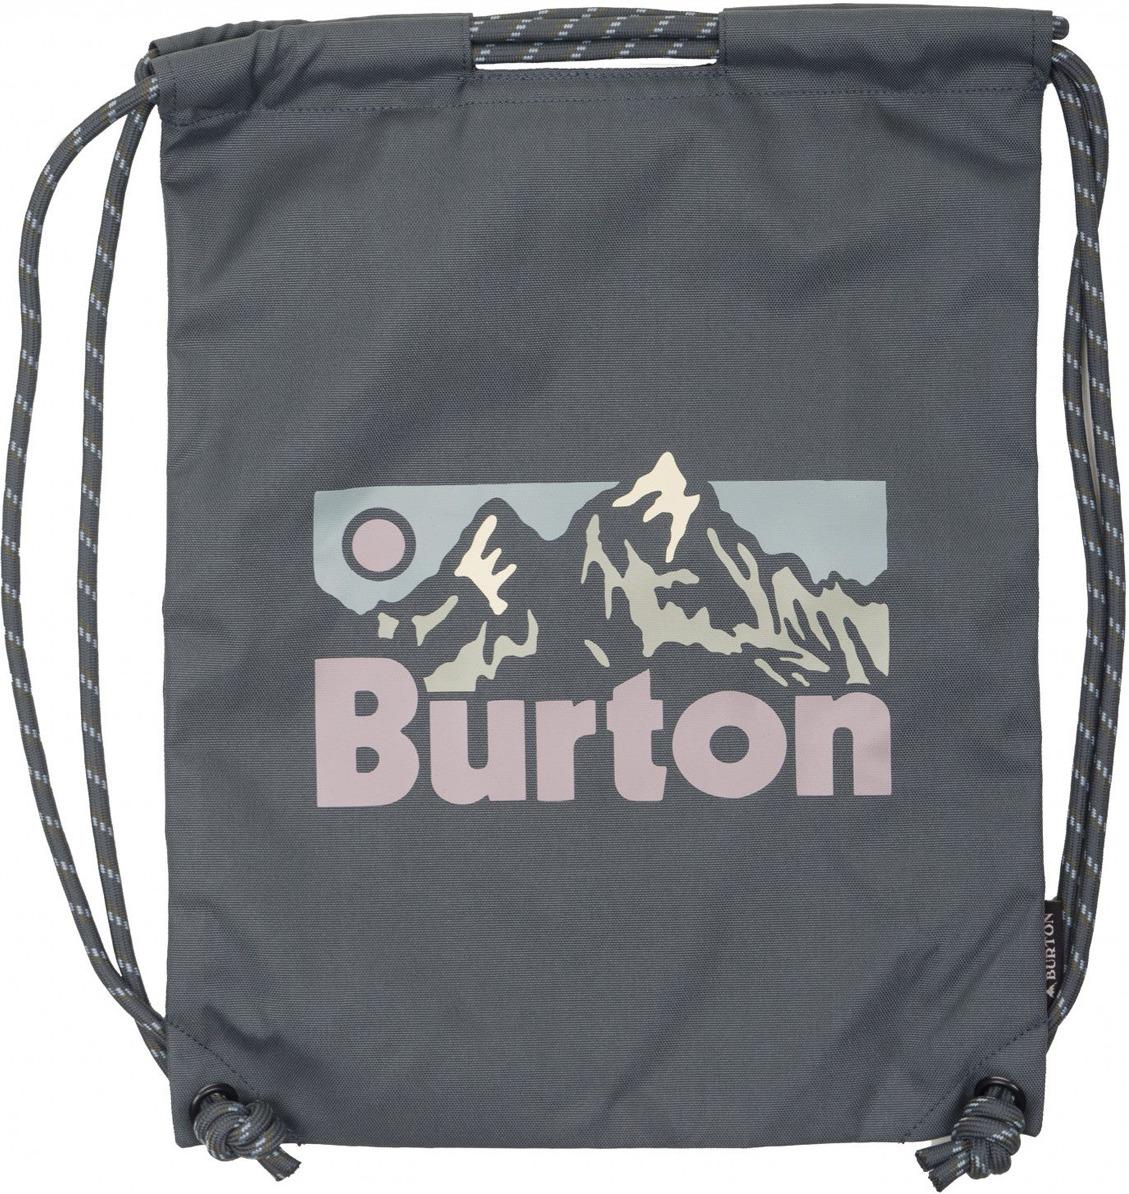 Рюкзак Burton Cinch Bag, 16697106020NA, серый, 13 л burton рюкзак cadet pack syrup herringbone win14